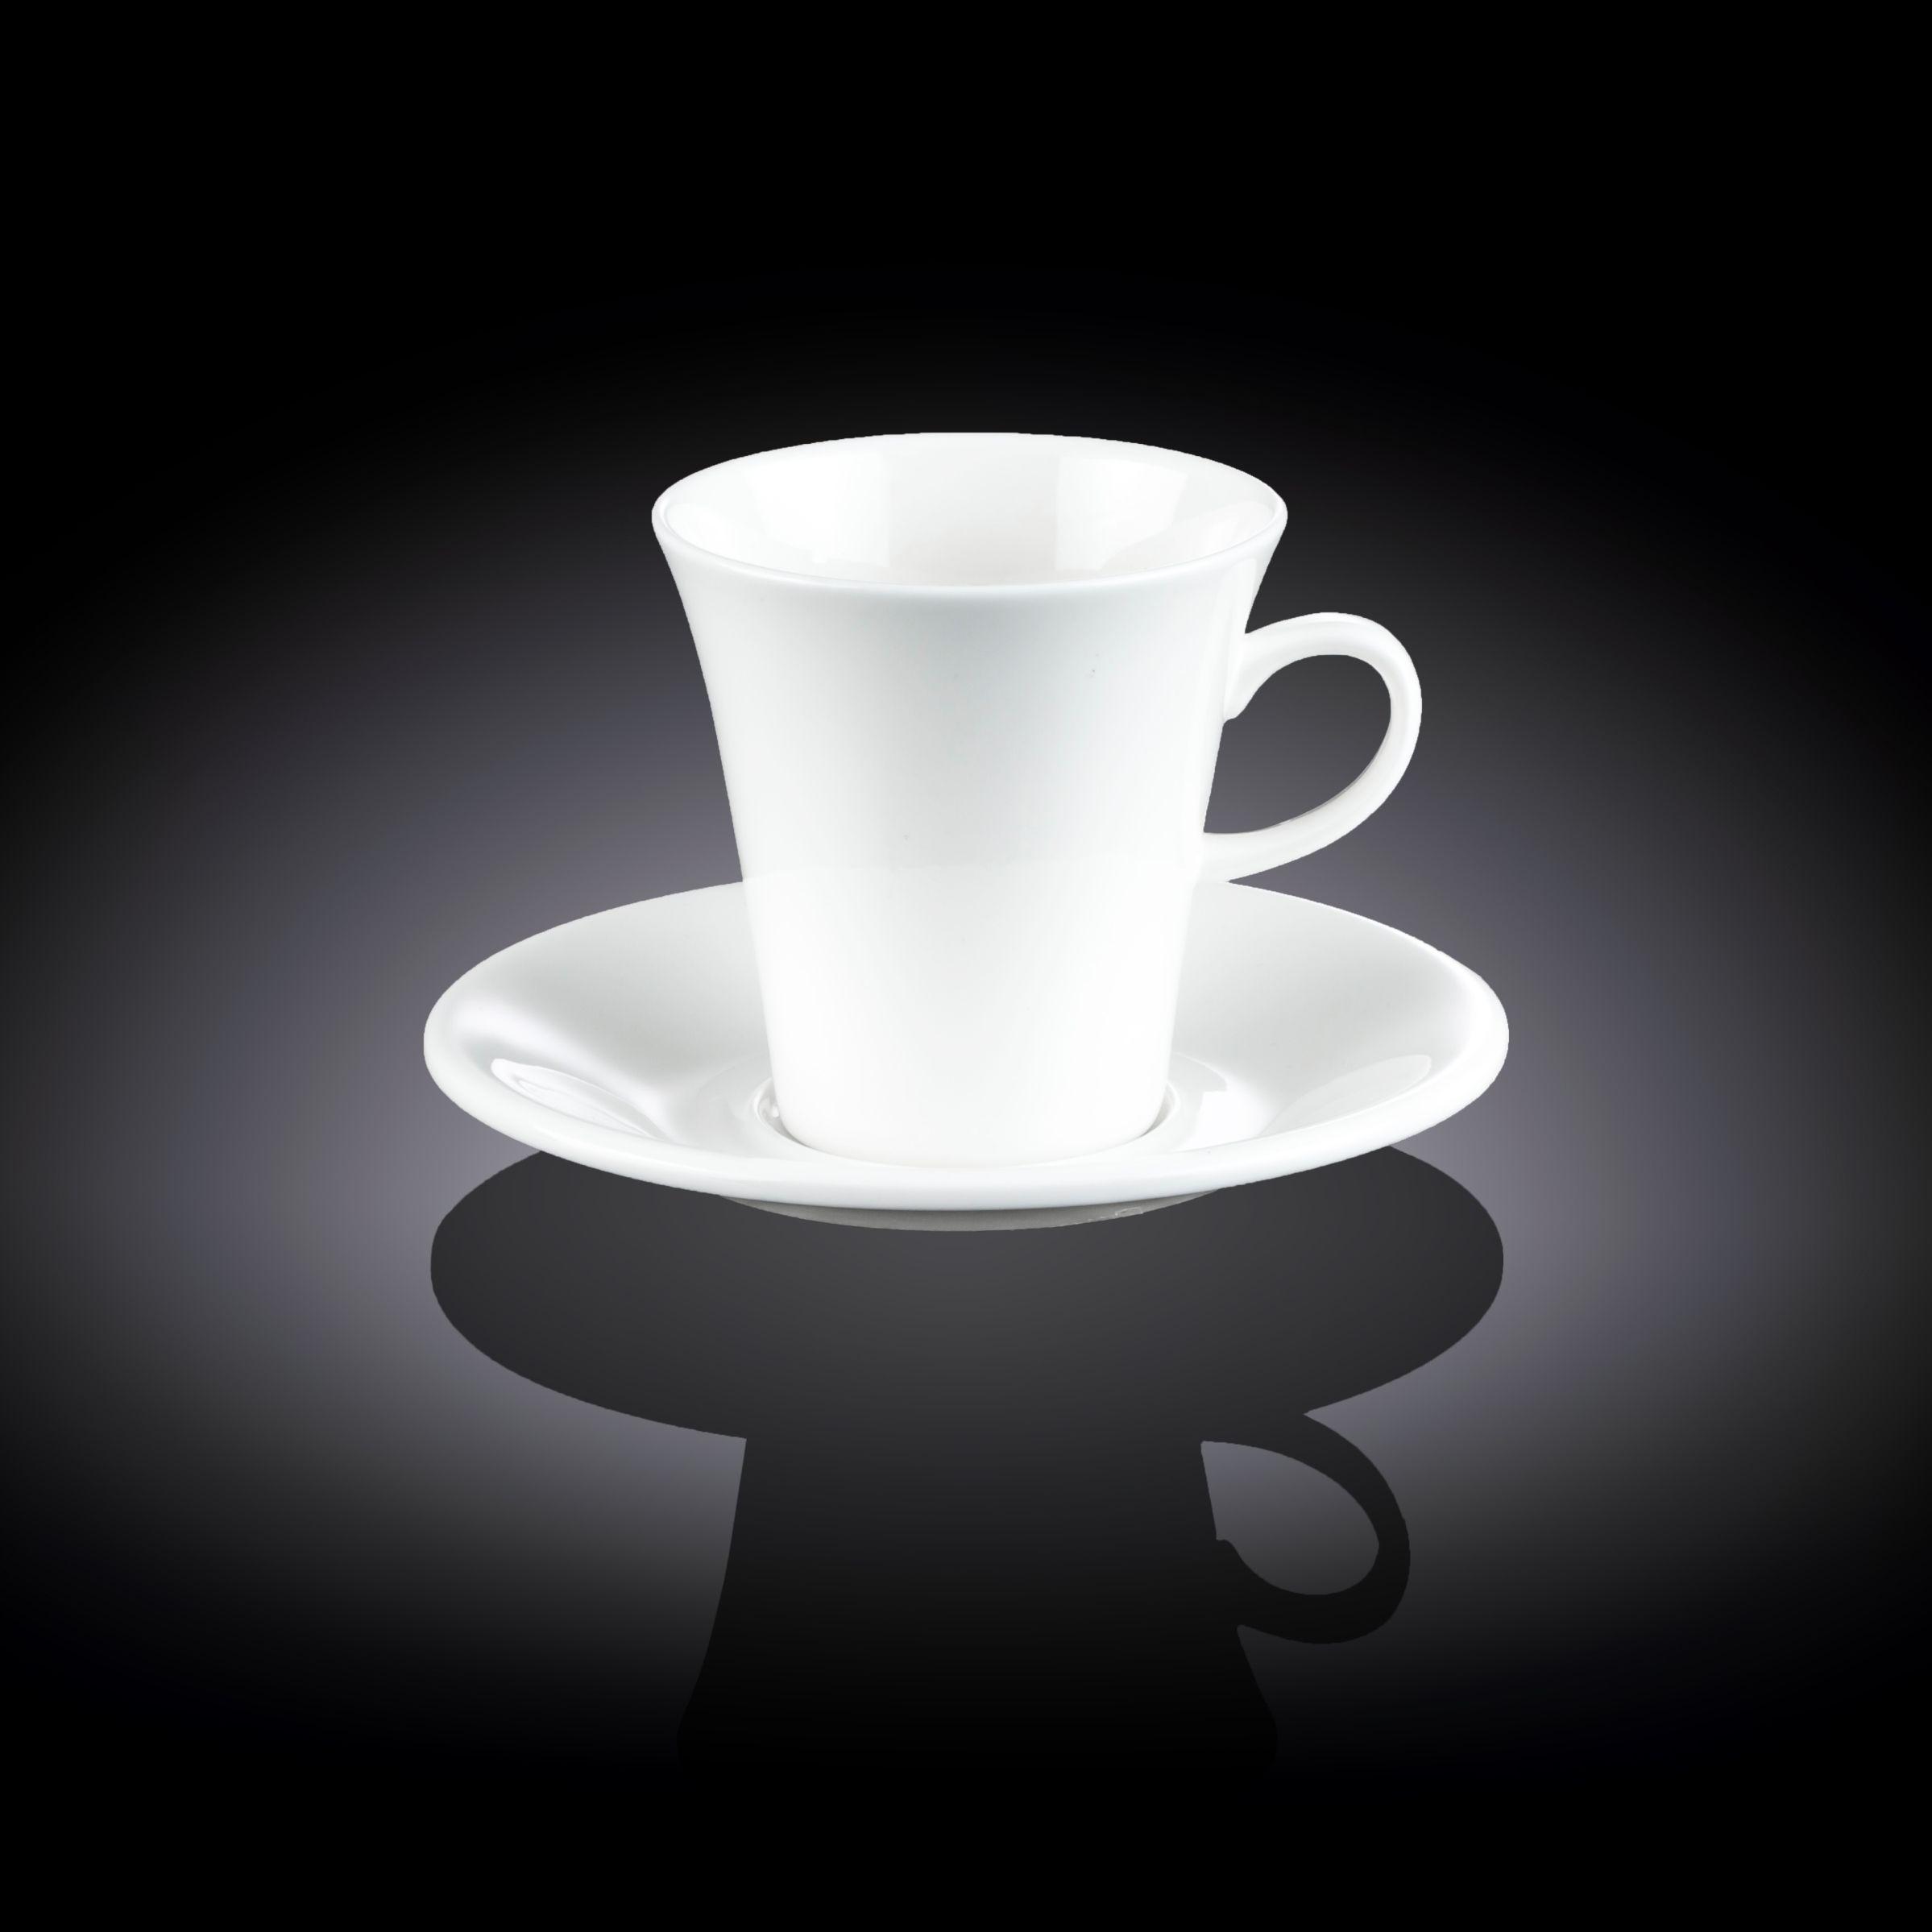 Набор: 300 мл чайная чашка & блюдце Wilmax